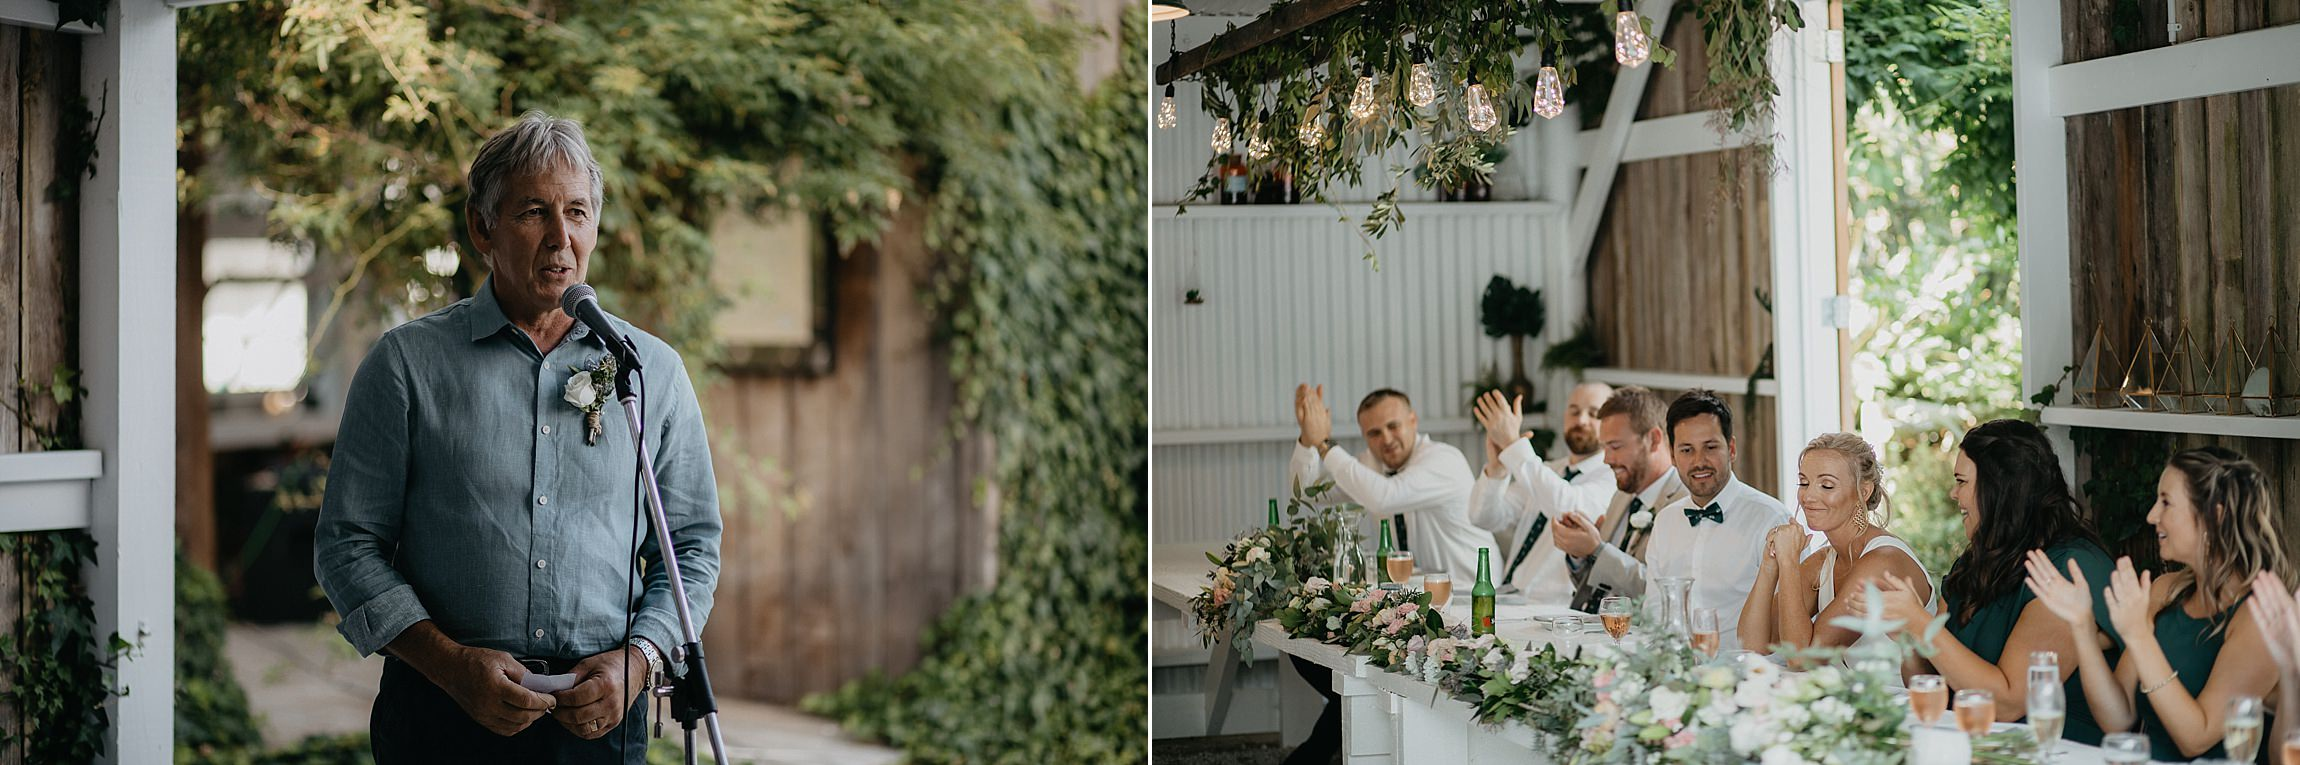 oldforestschool-wedding-blog-152.jpg